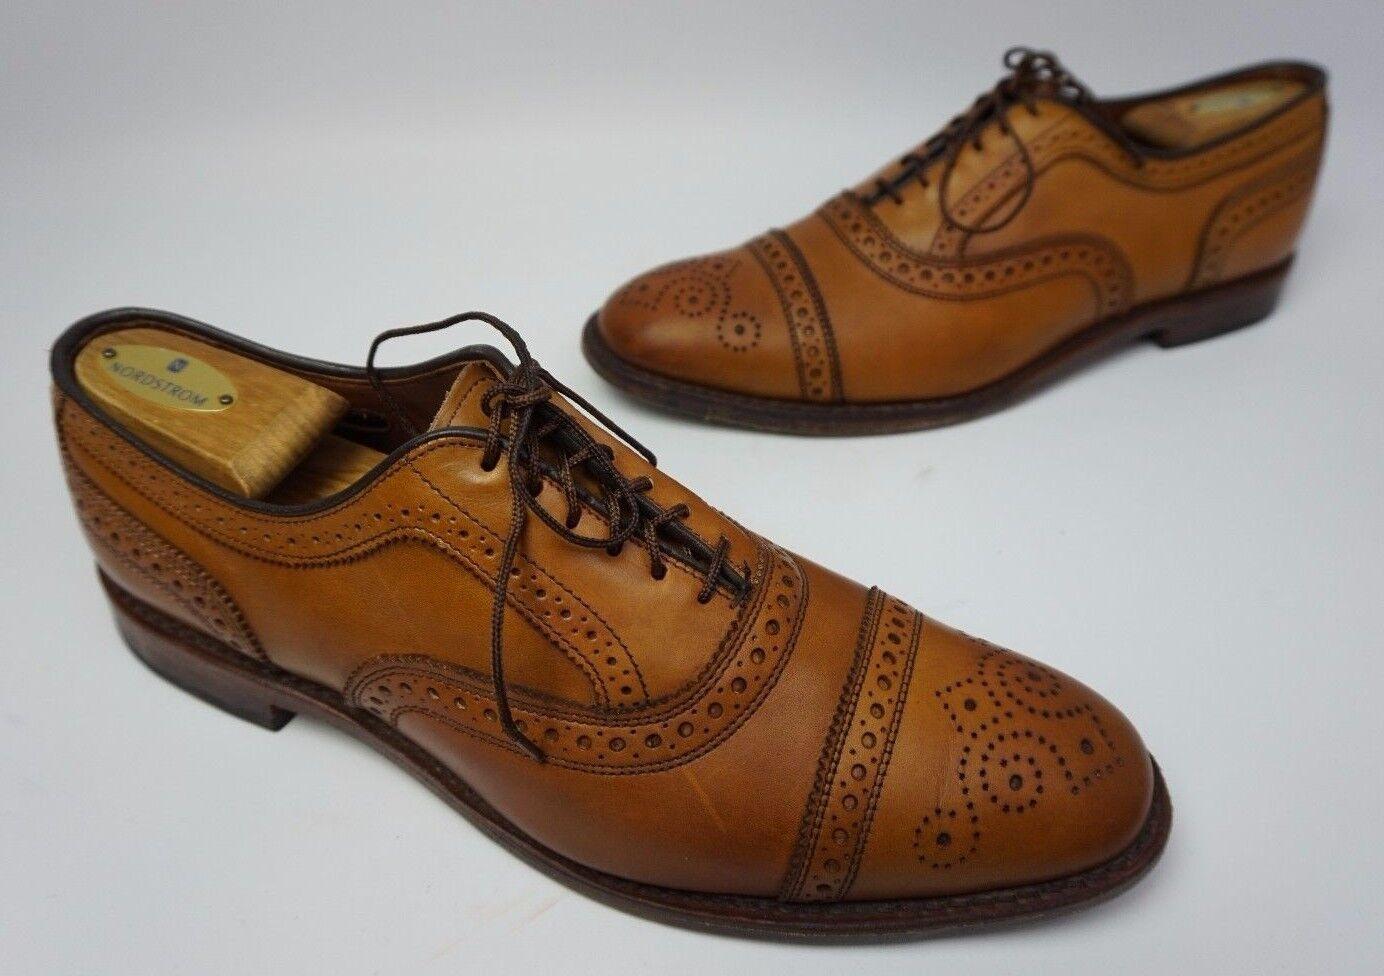 Allen Edmonds Strand Cap Toe Oxford Walnut braun Leather Leather Leather schuhe Größe 10 B  385+ 0c2c83